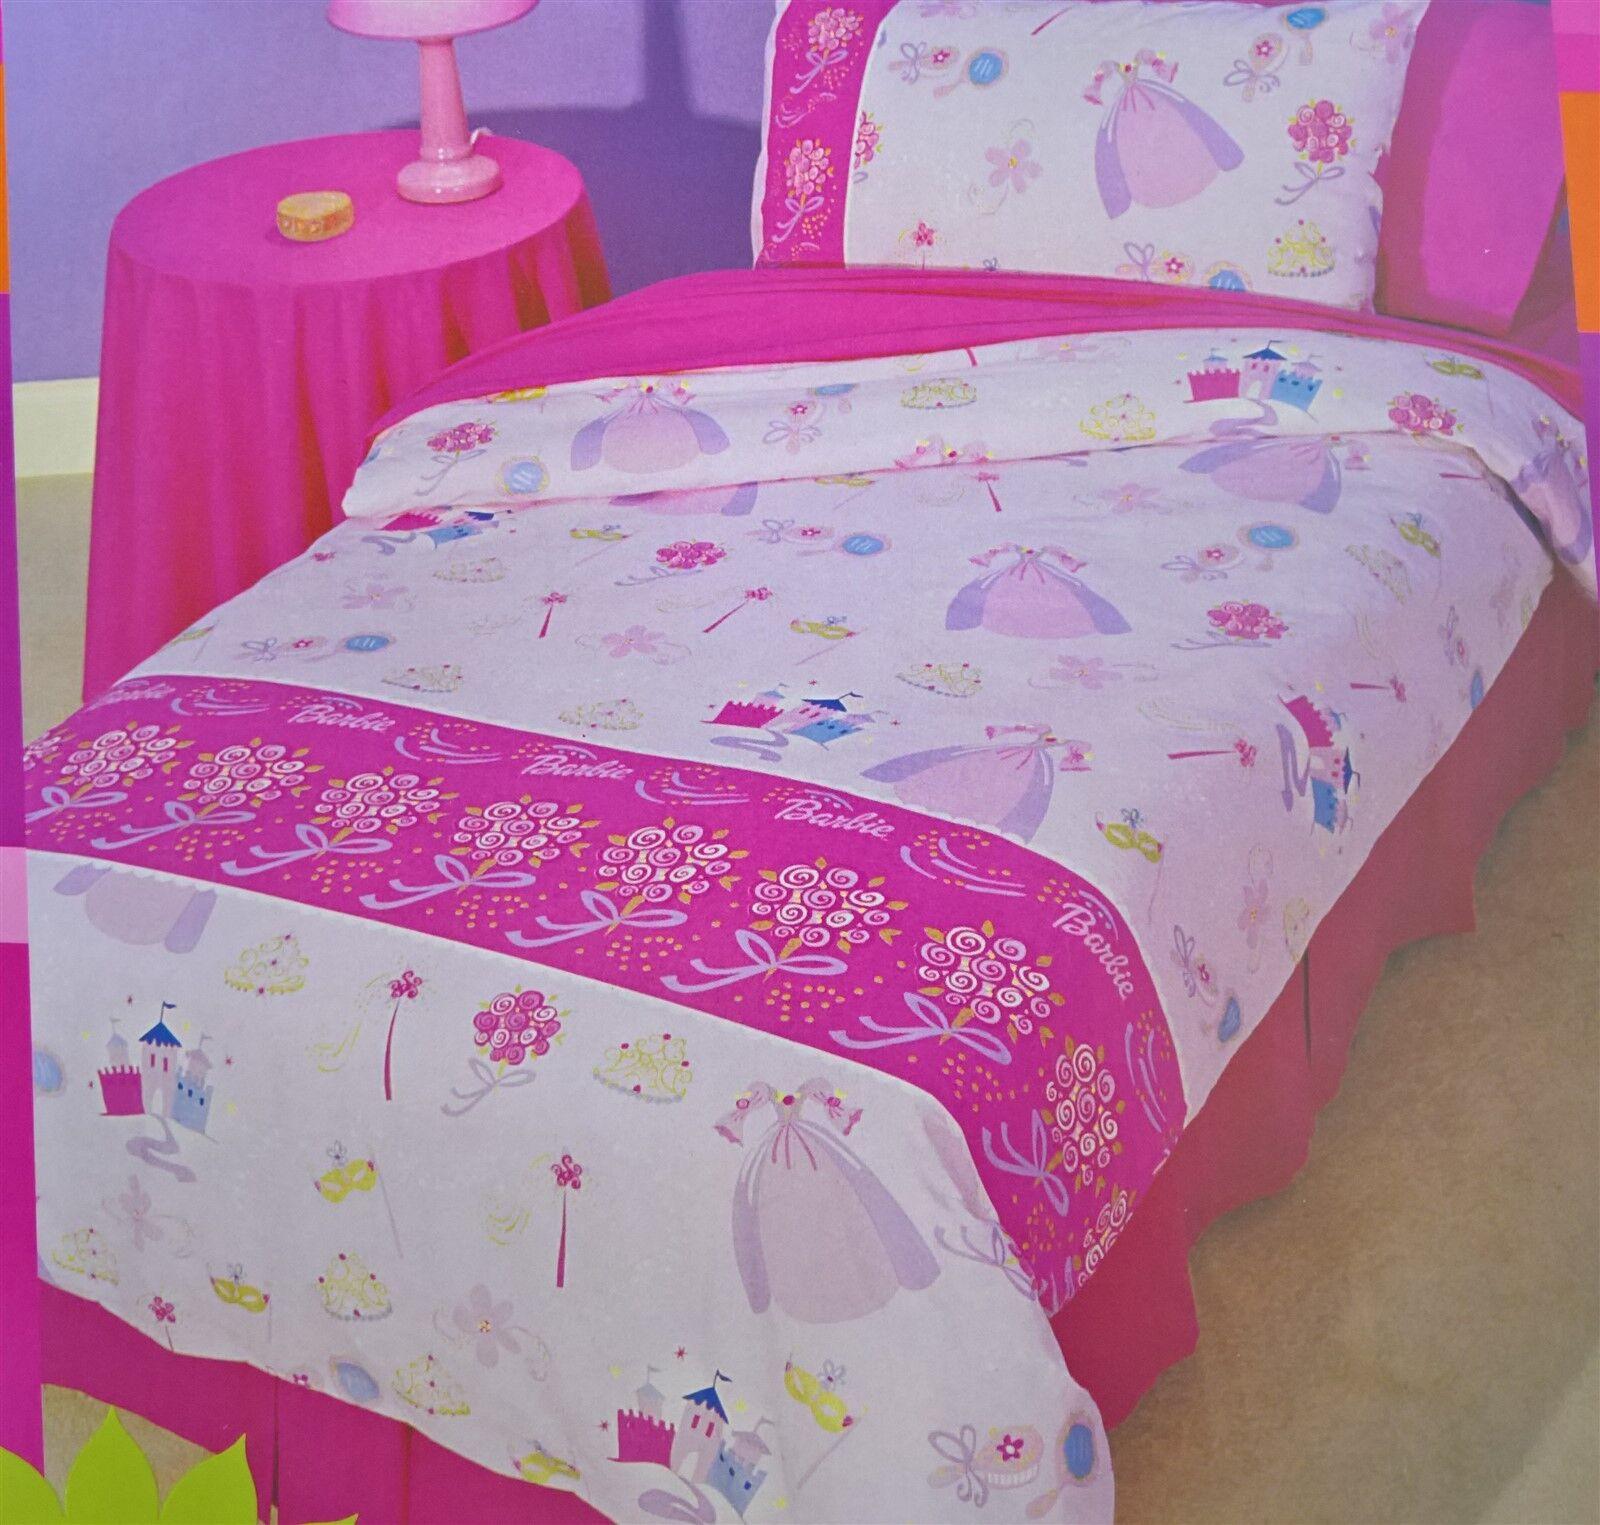 Barbie - DREAM DOUBLE BED DOONA QUILT DUVET COVER